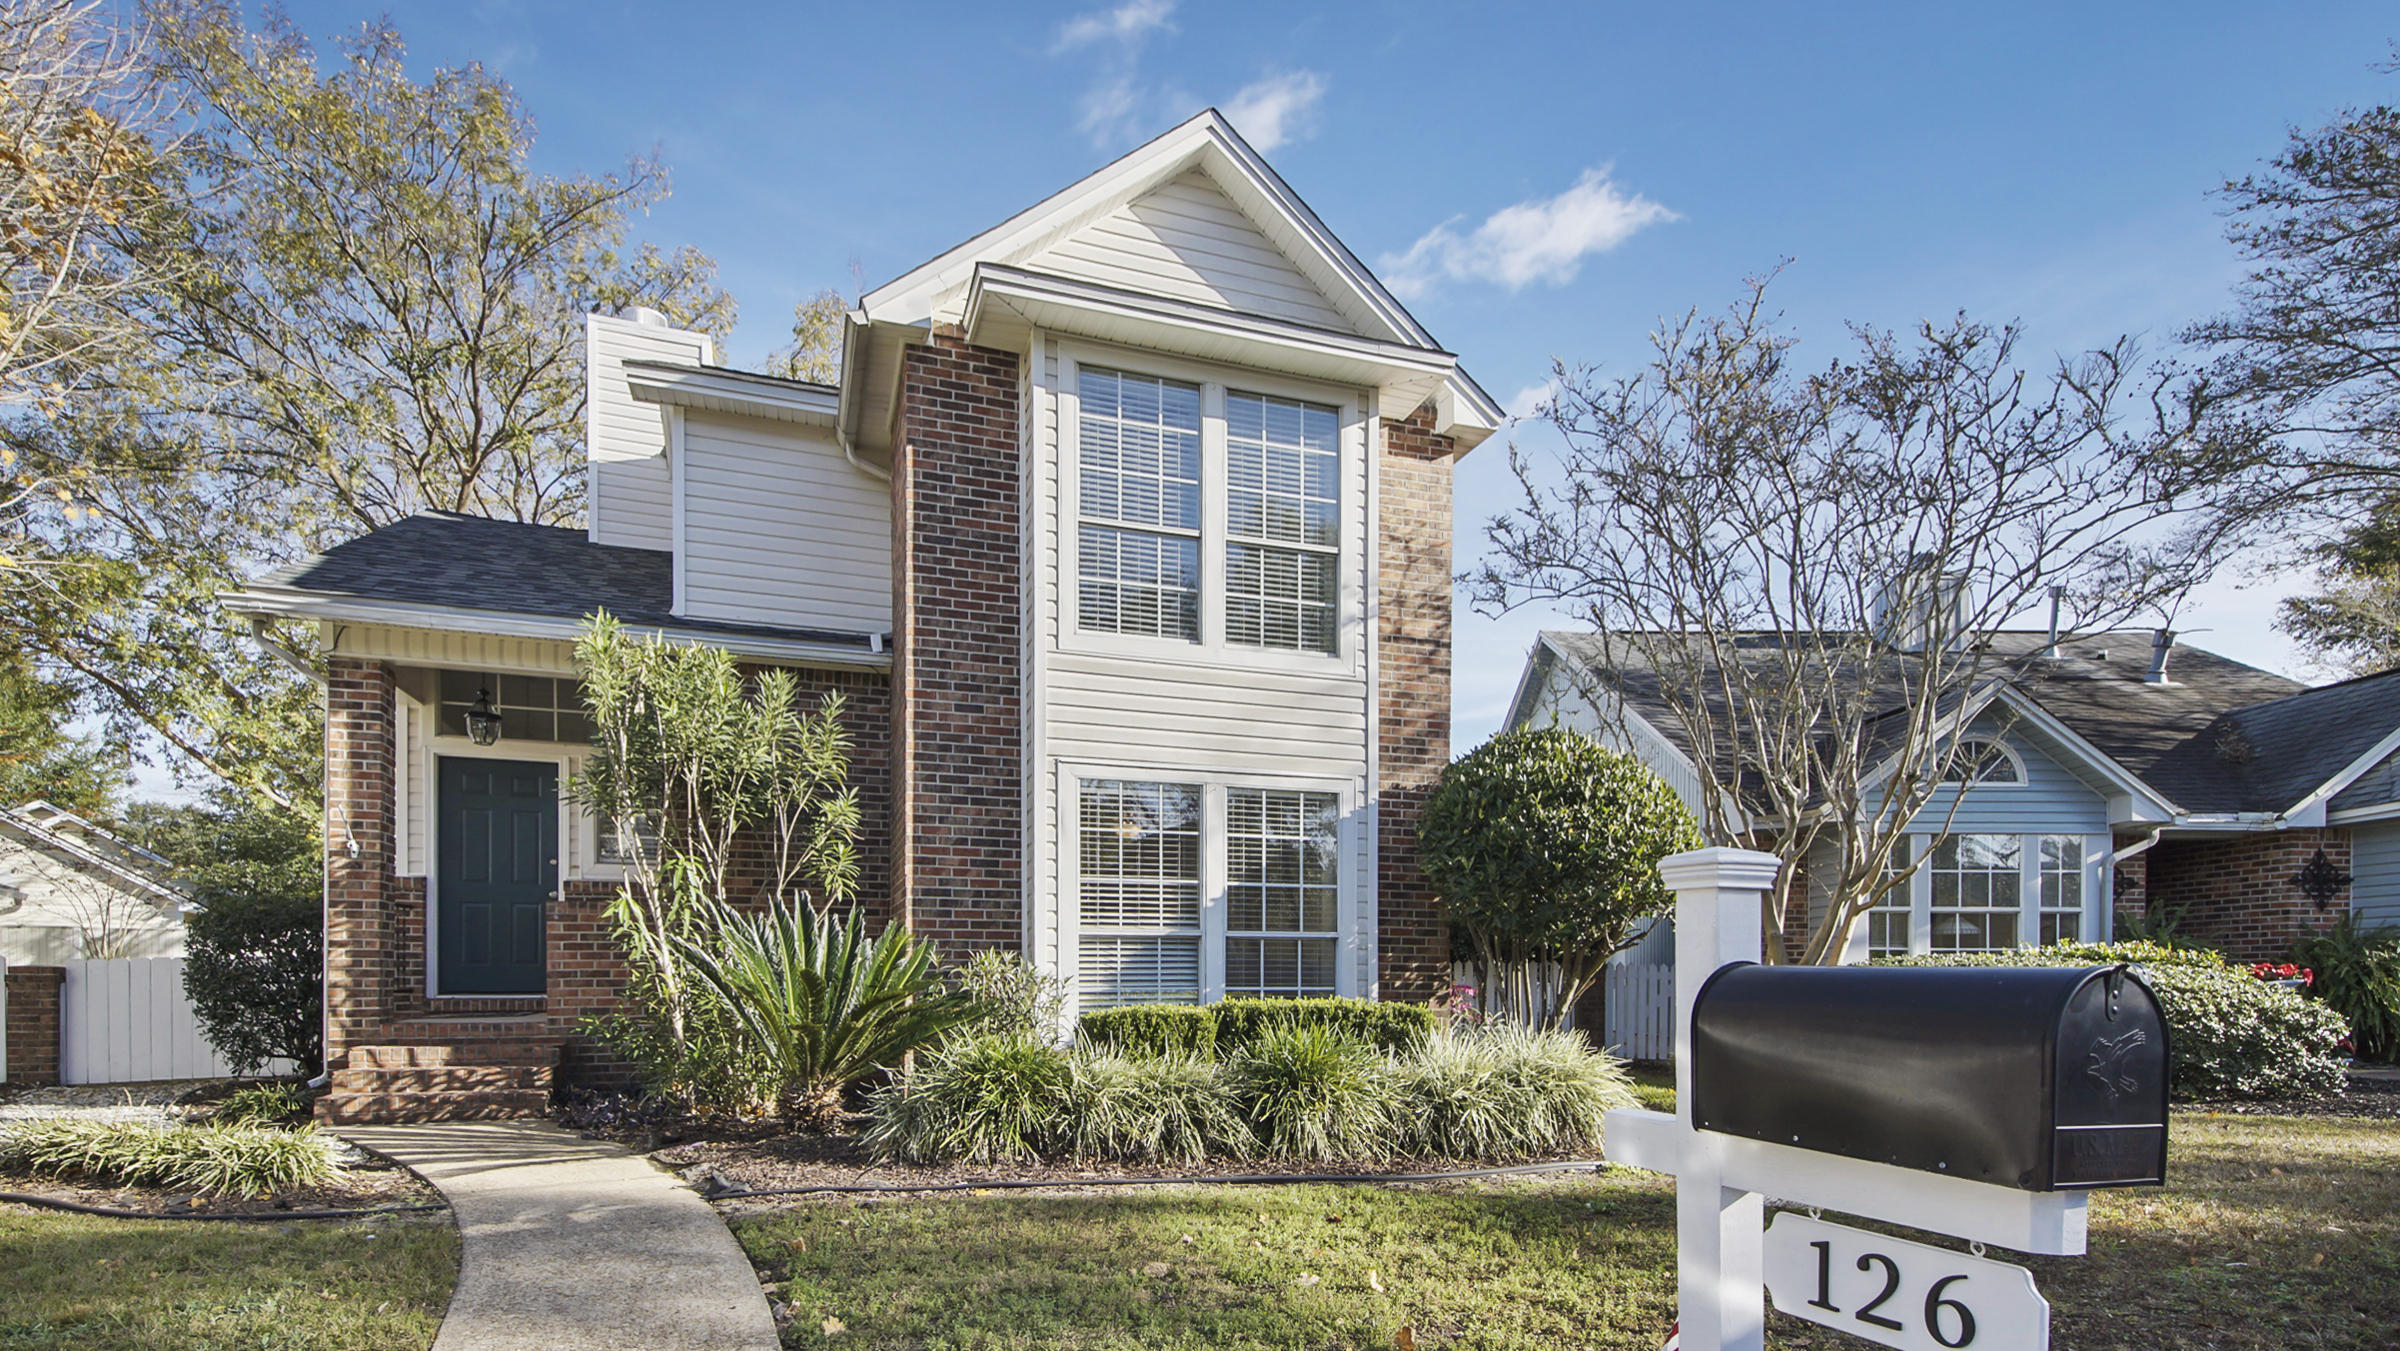 Photo of home for sale at 126 Parkwood, Niceville FL